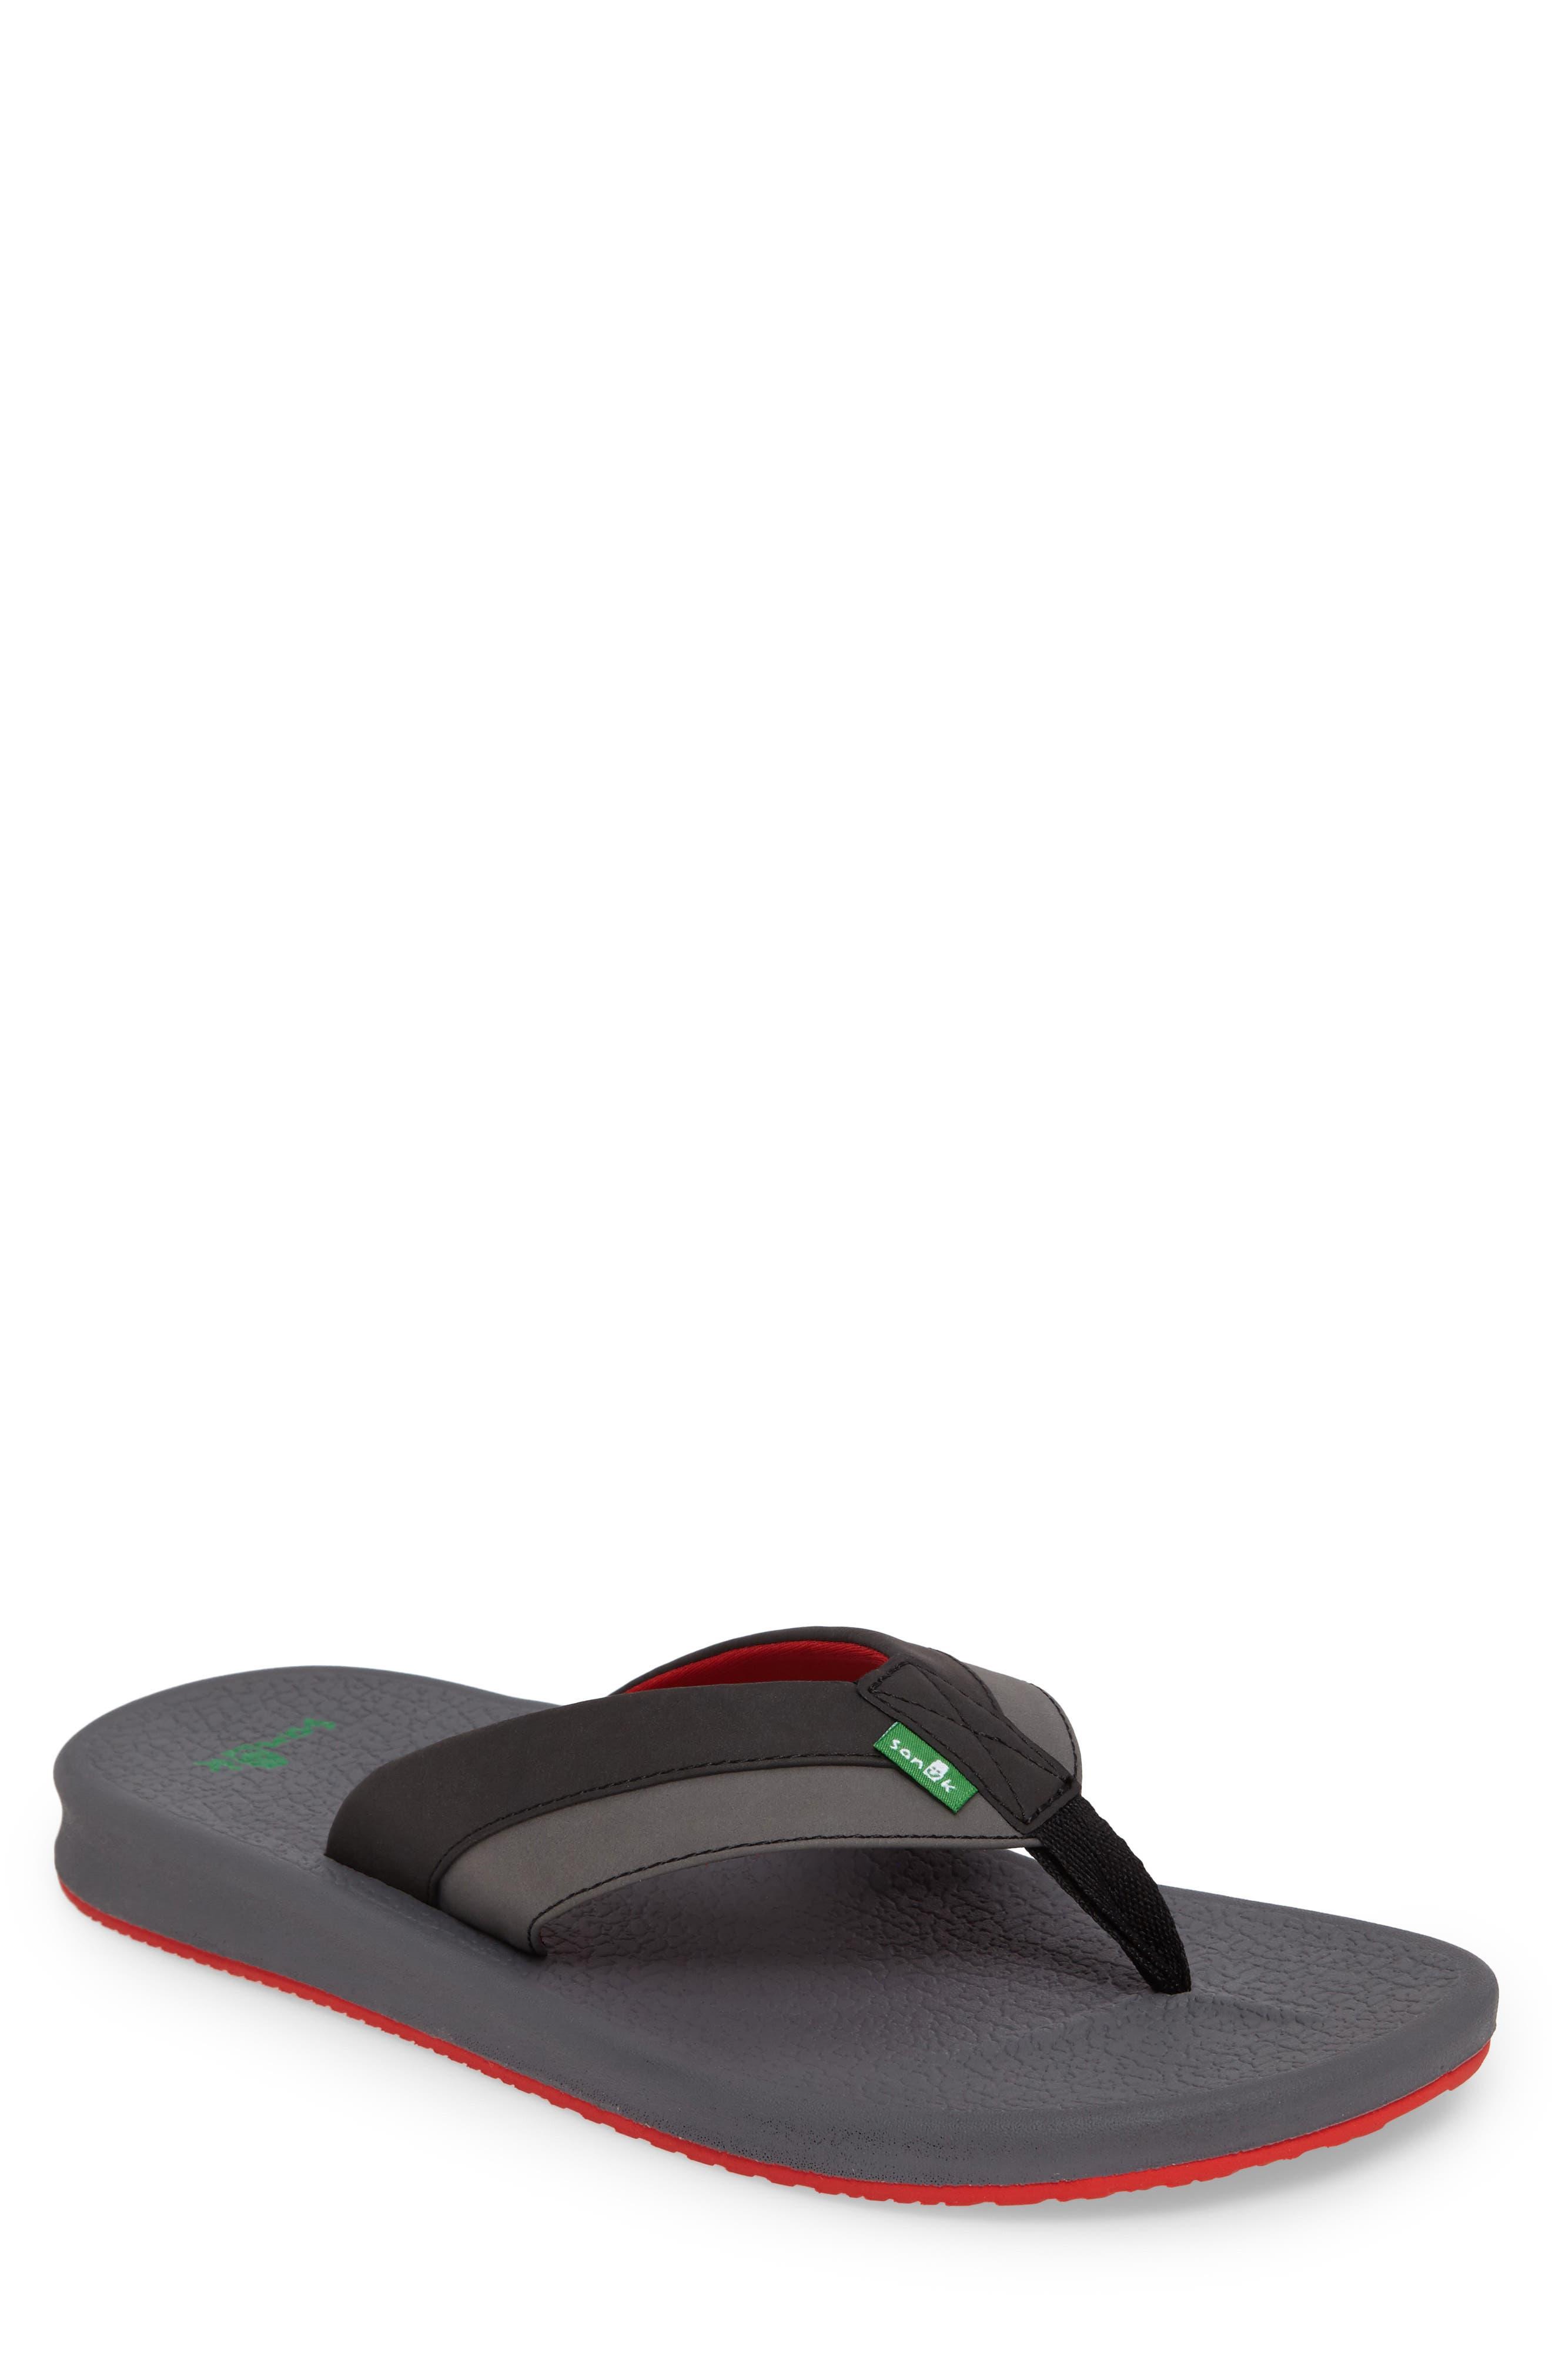 Brumeister Flip Flop,                         Main,                         color, 030